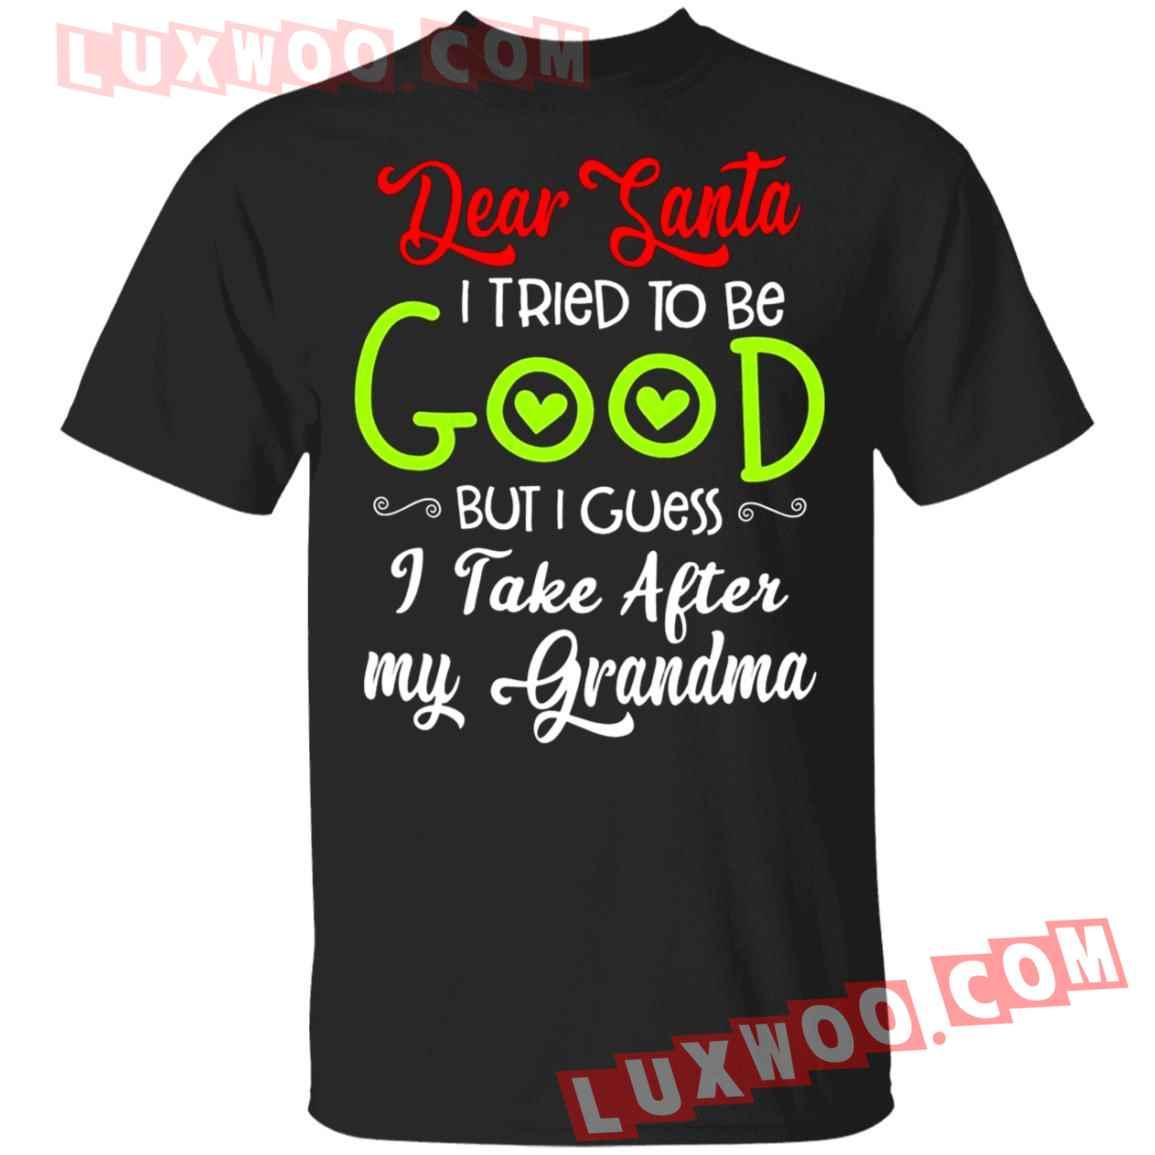 Dear Santa I Tried To Be Good But I Guess I Take After My Grandma Shirt